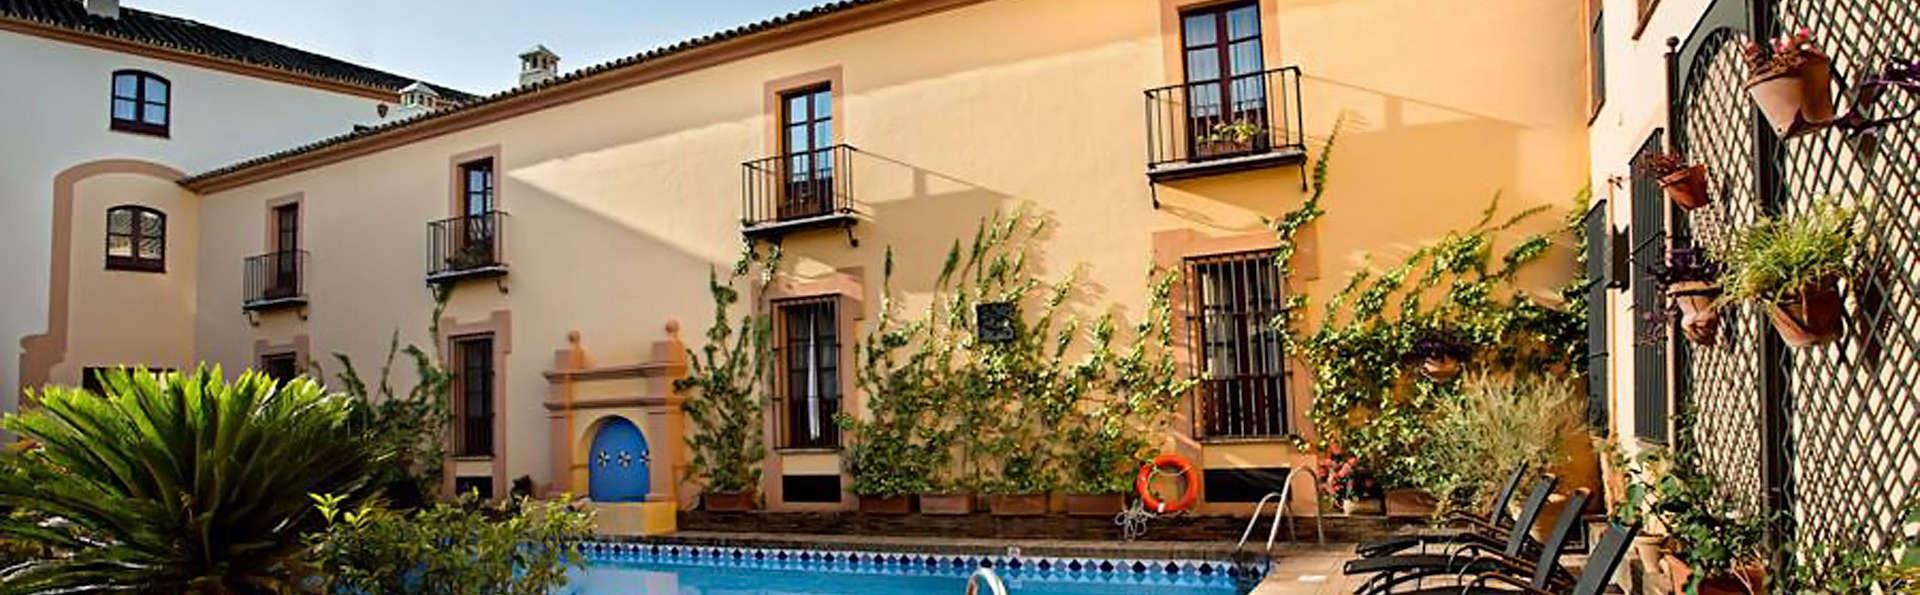 Hotel Alcázar de la Reina - EDIT_pool2.jpg